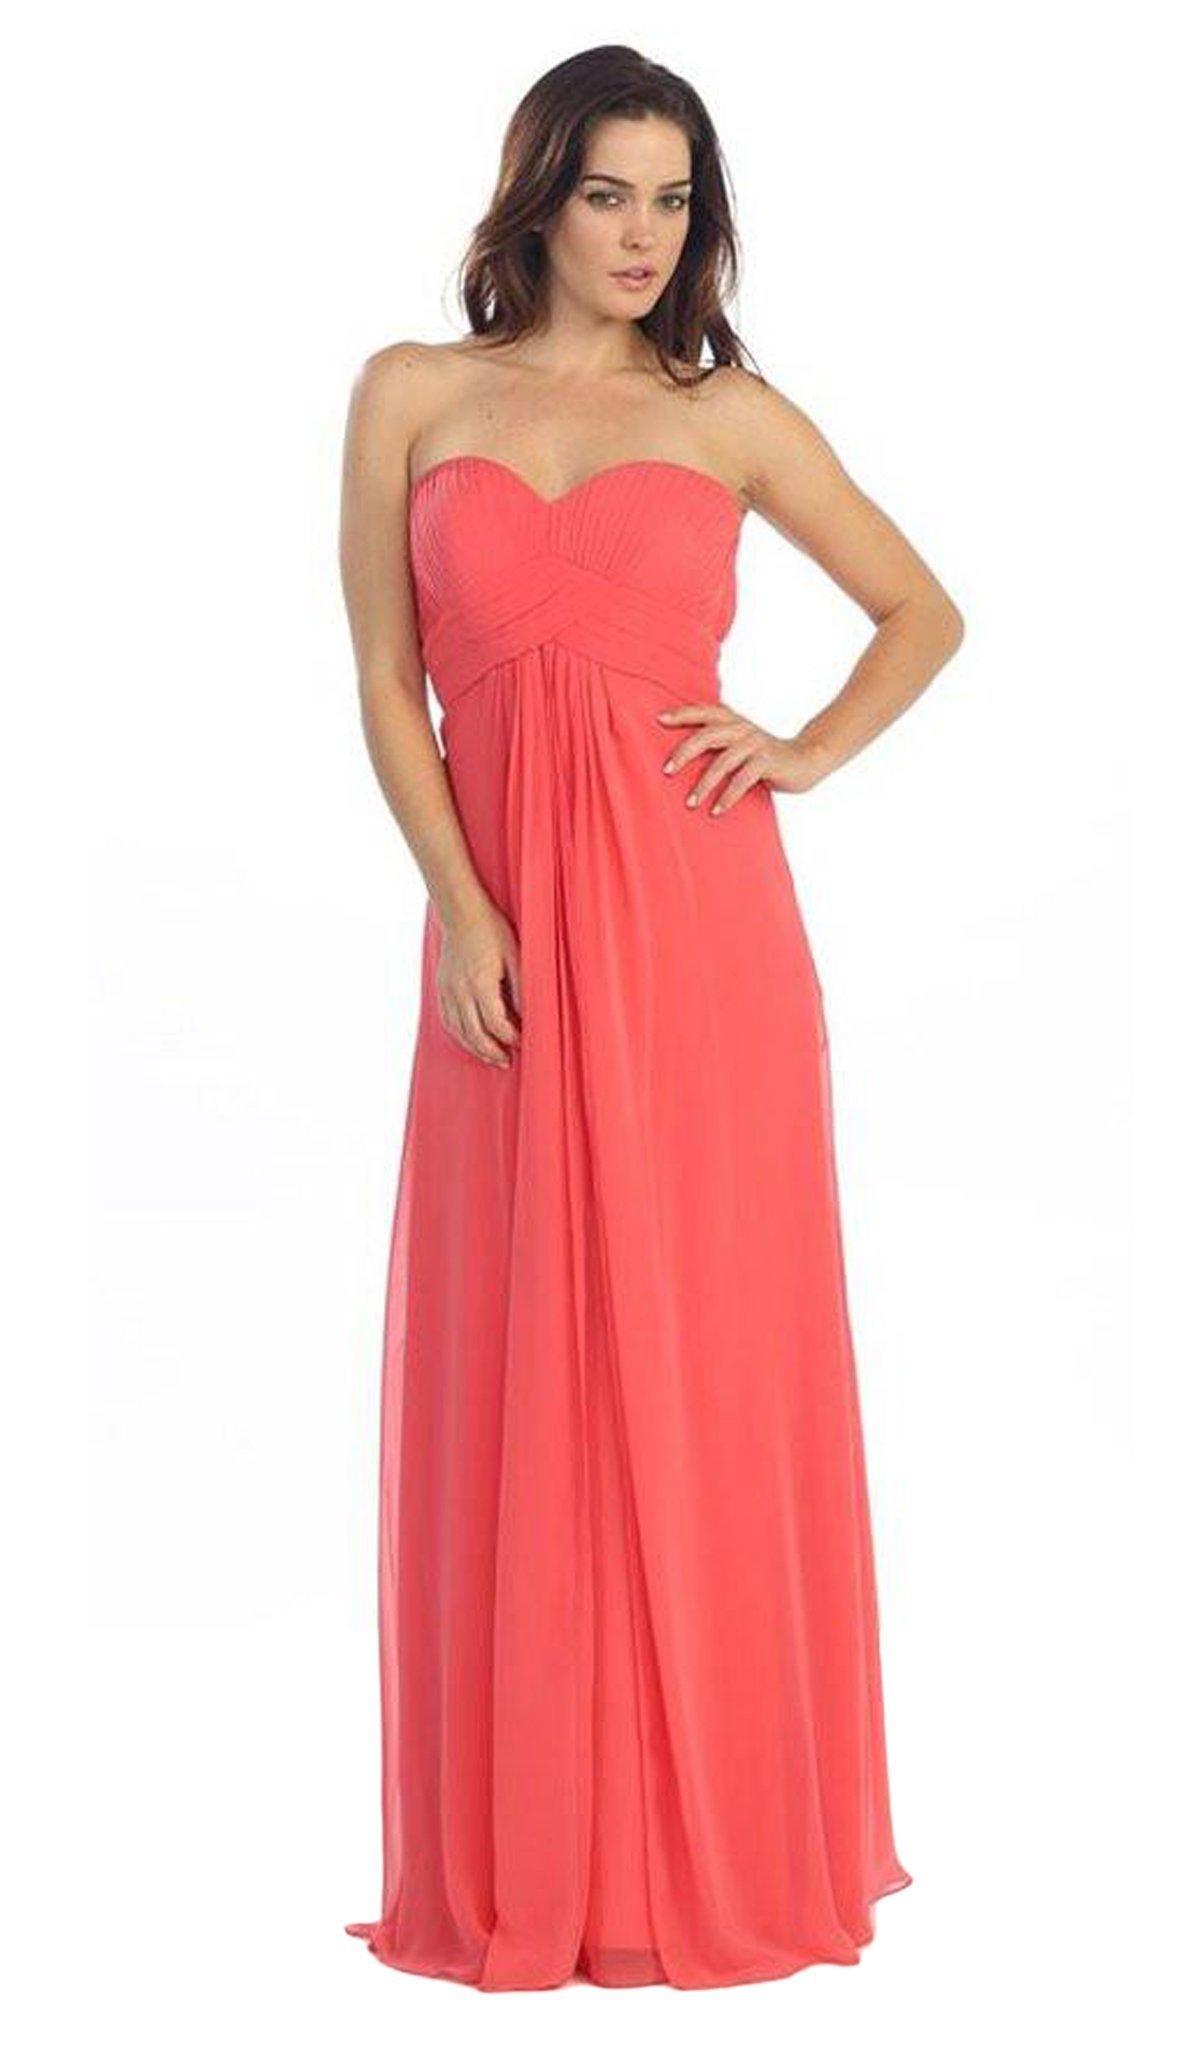 Eureka Fashion - 2600-1 Pleated Strapless Sweetheart Chiffon Gown